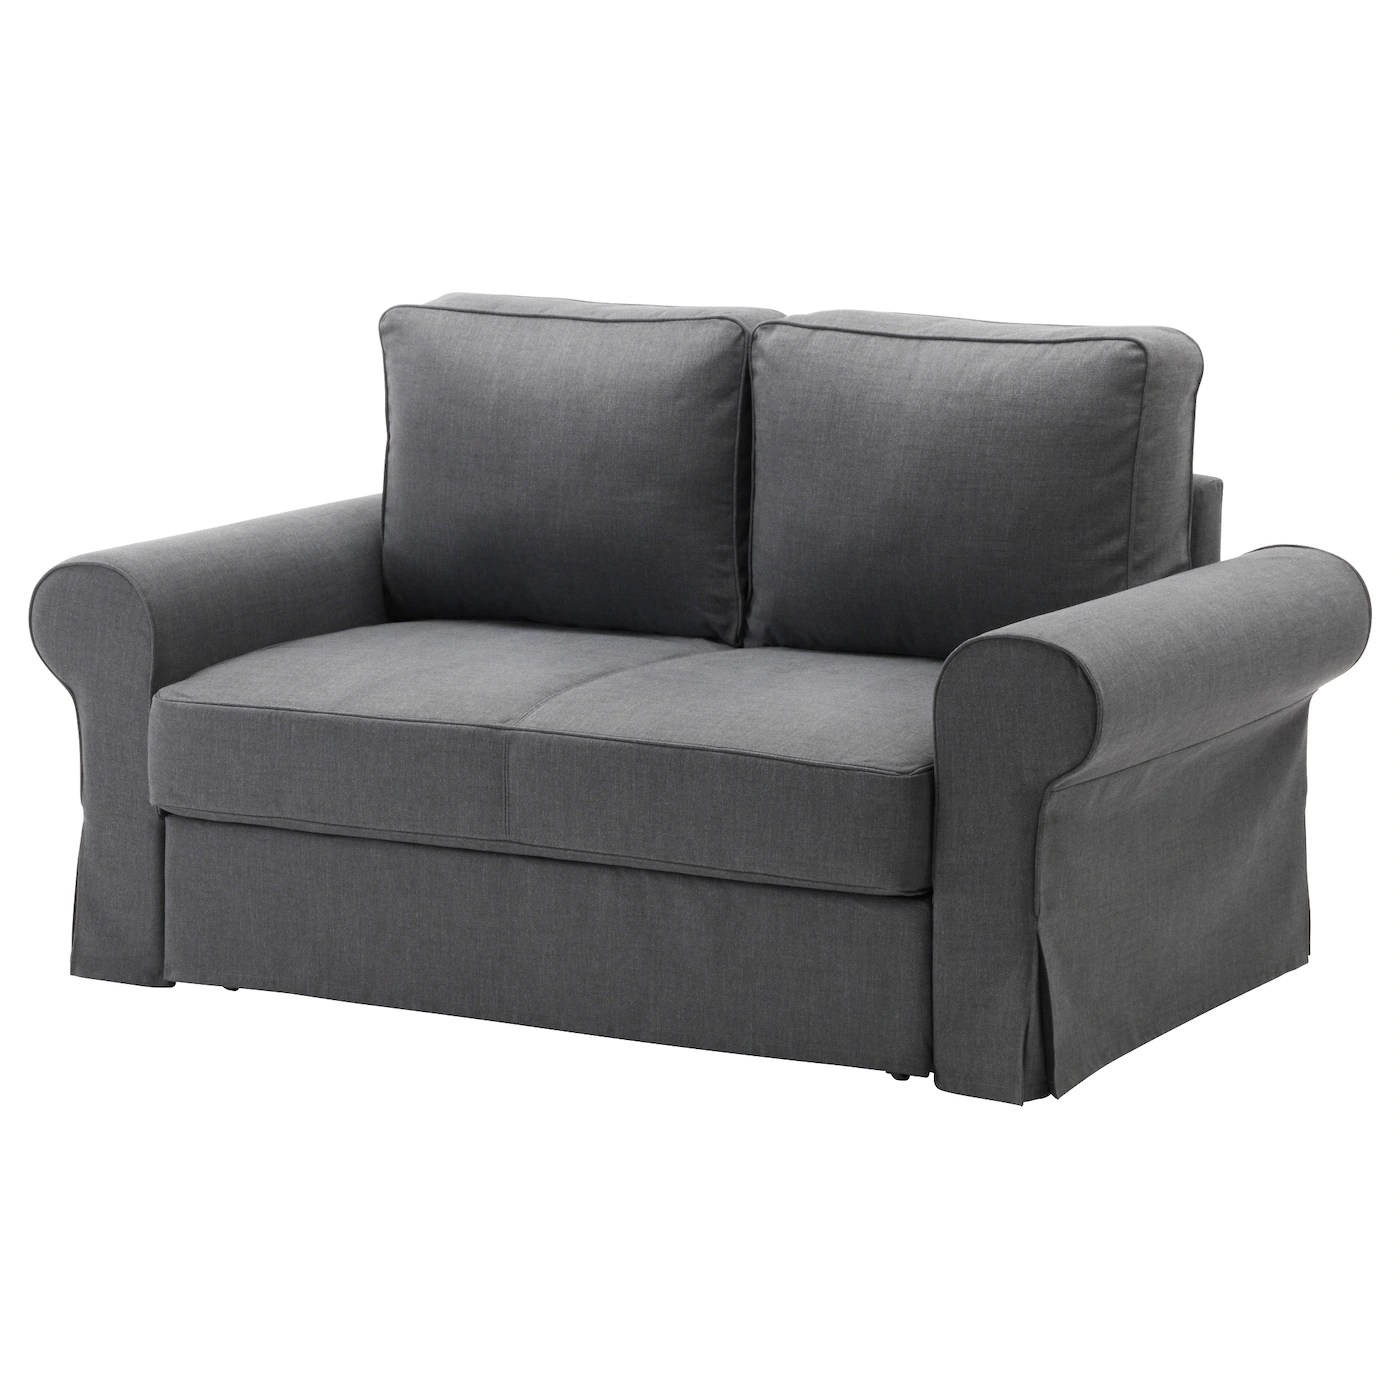 sofa chair bed ikea x rocker pulse gaming backabro two seat nordvalla dark grey